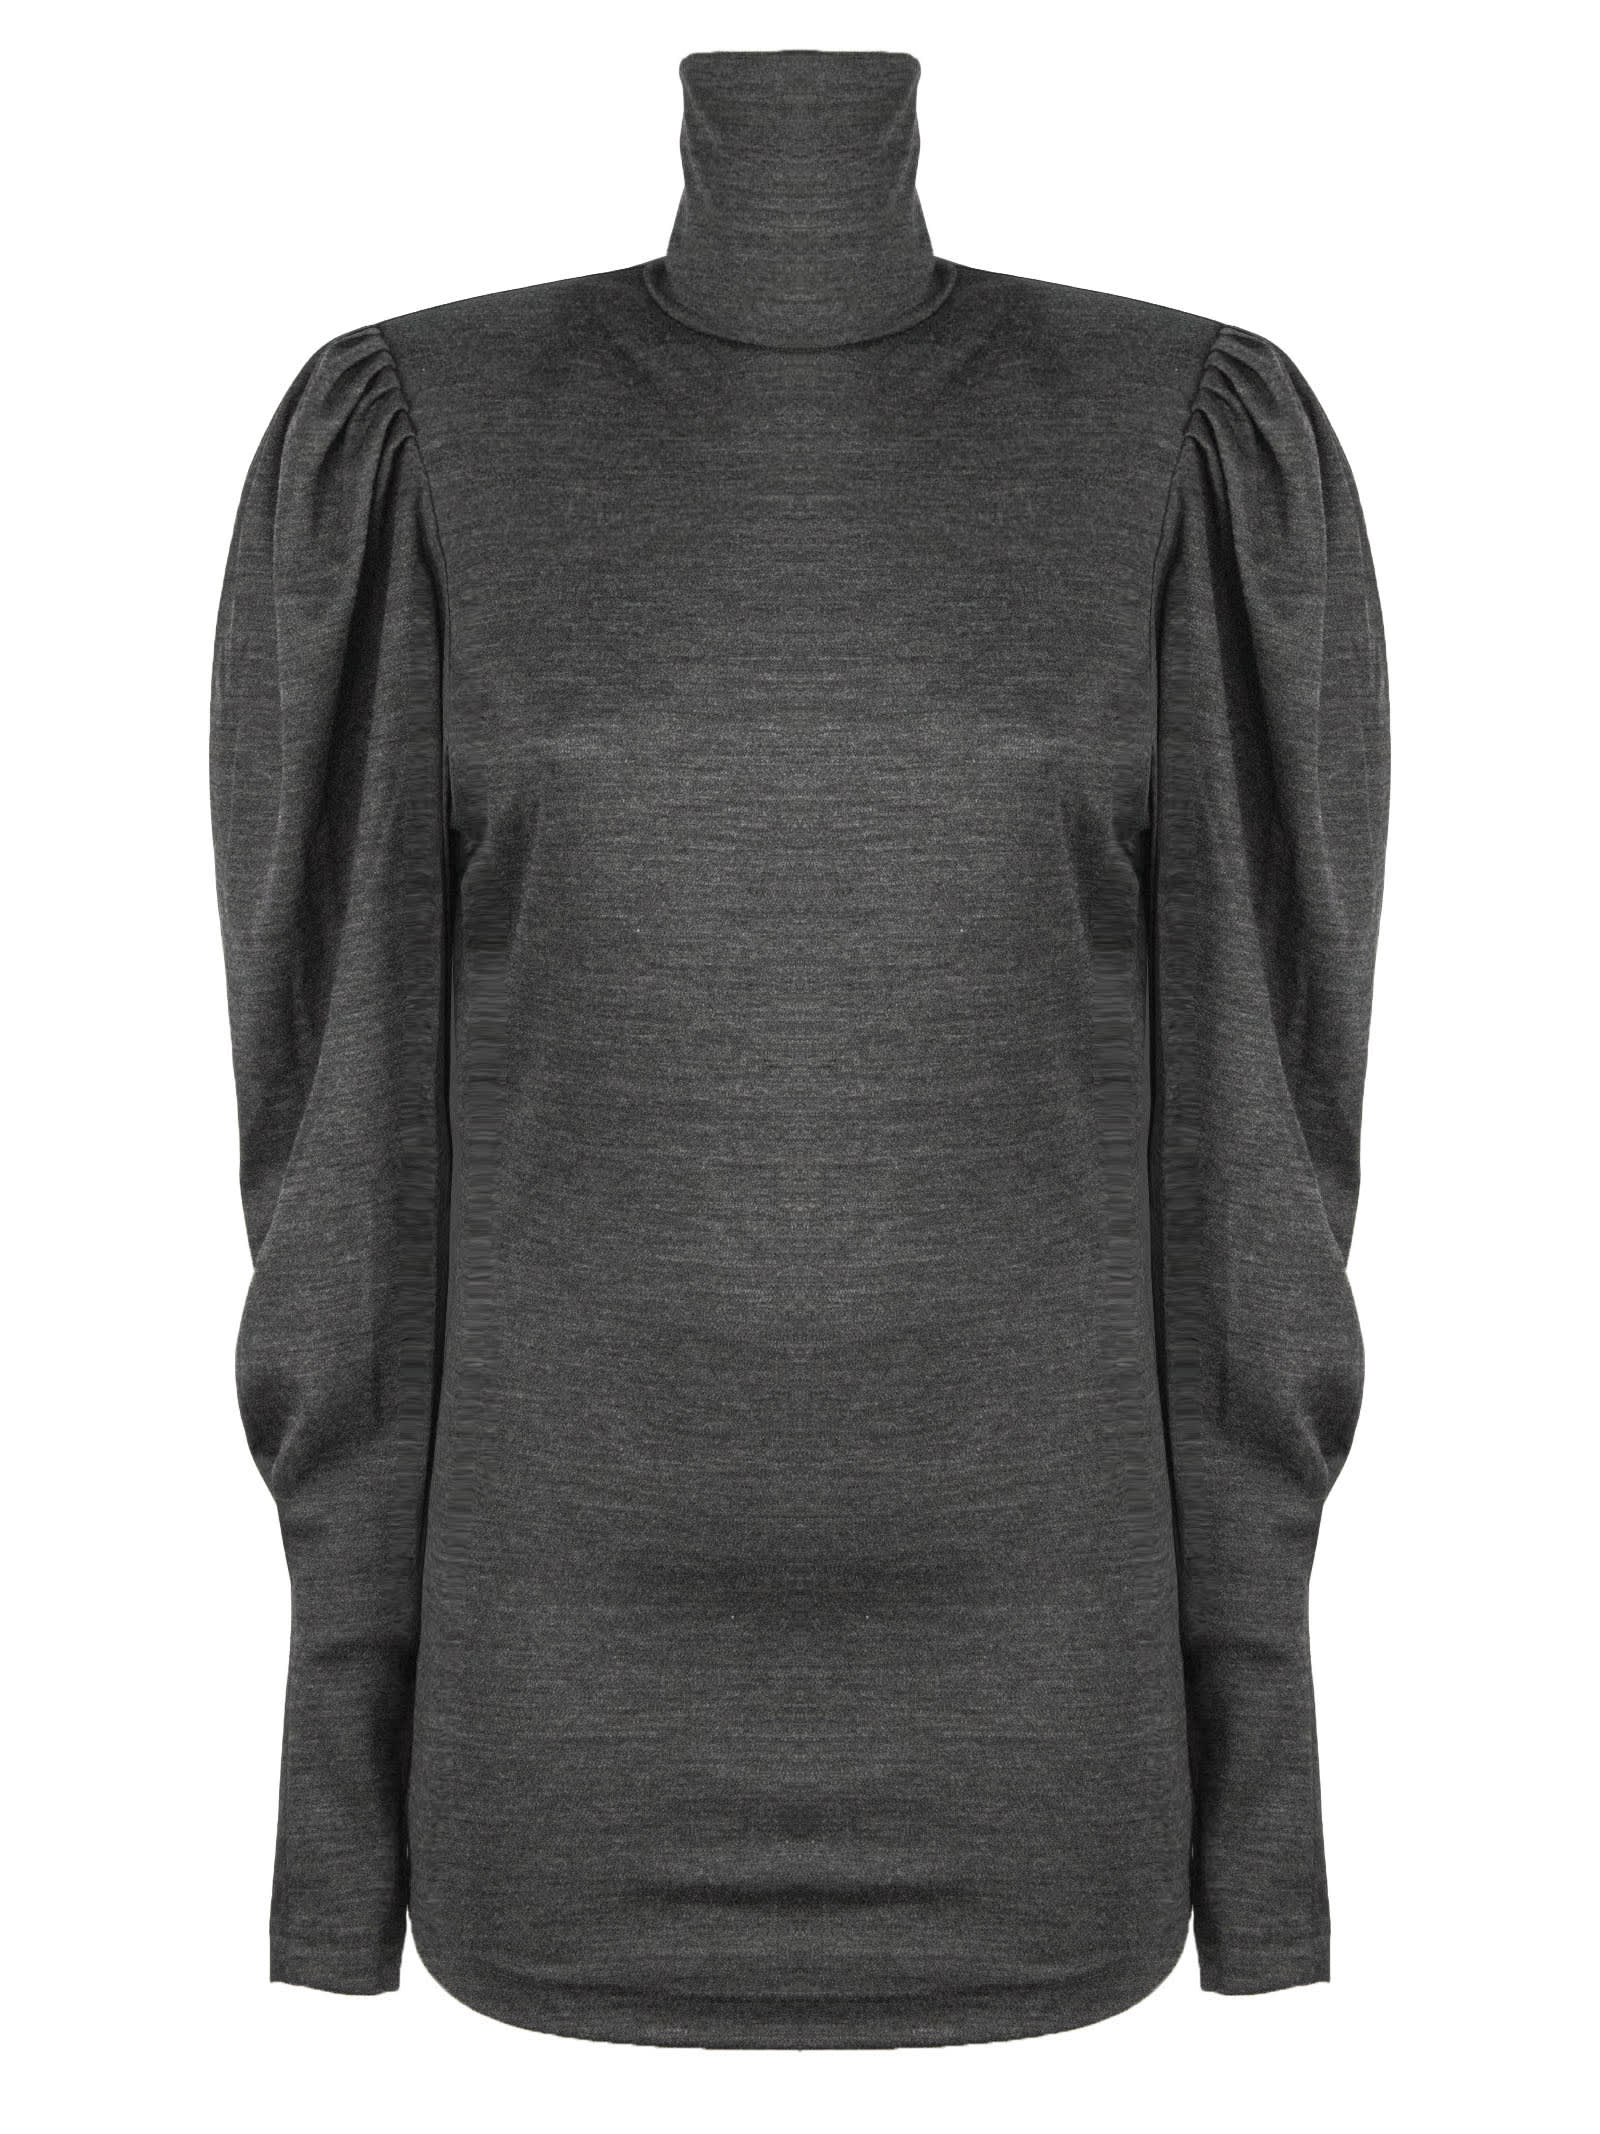 Isabel Marant Gavina Topwear In Grey Wool In Grigio